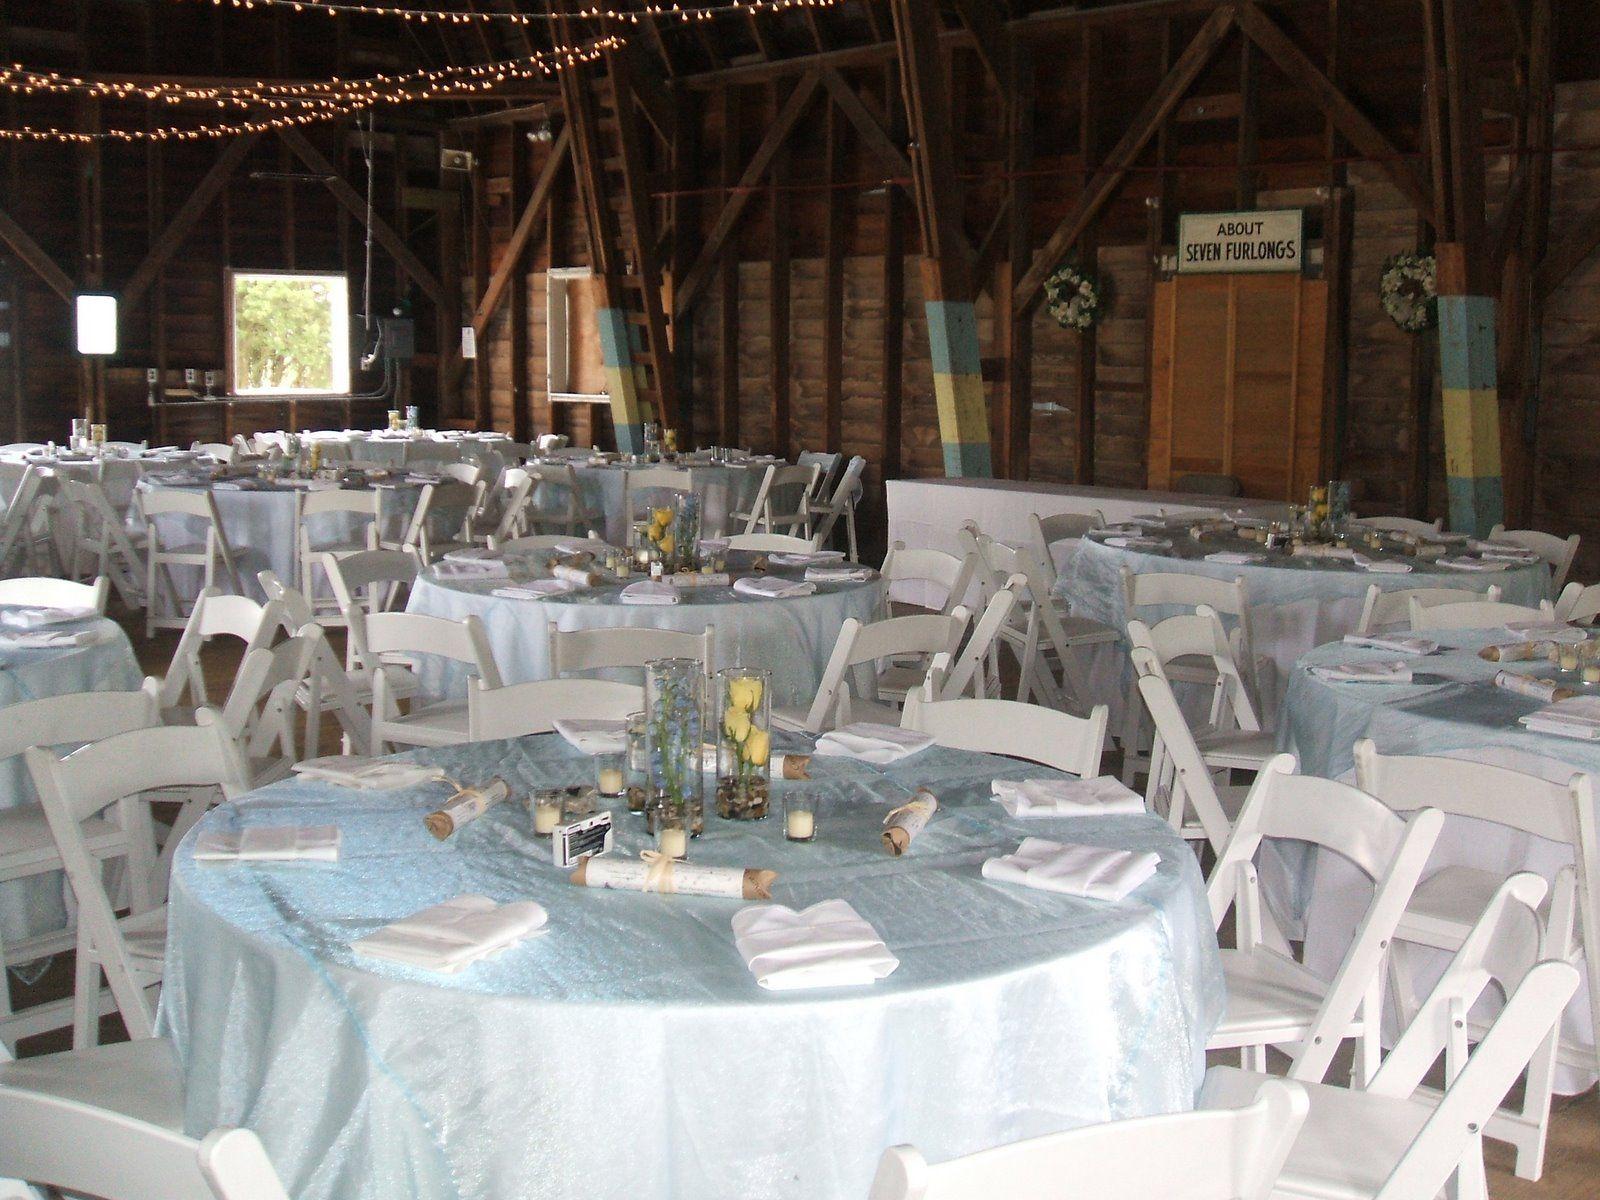 687d29721b63ddb4bb347976fbee117f - the tea barn at fair hill wedding